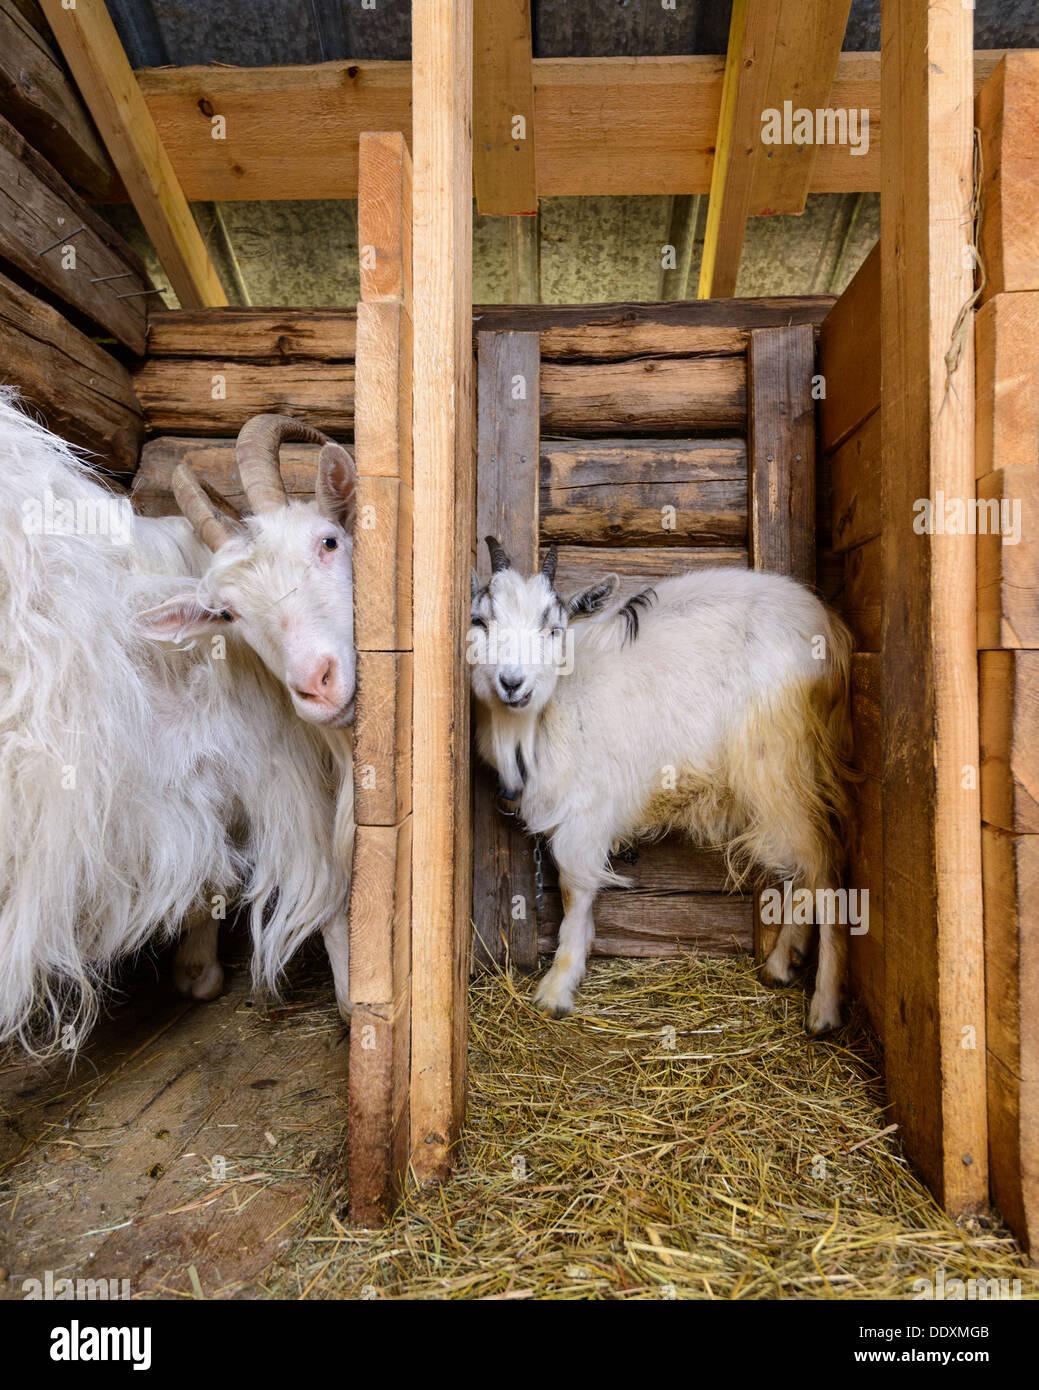 Goats in barn, Arvselen, Dalarna, Malung-Sälen kommun, Sweden - Stock Image